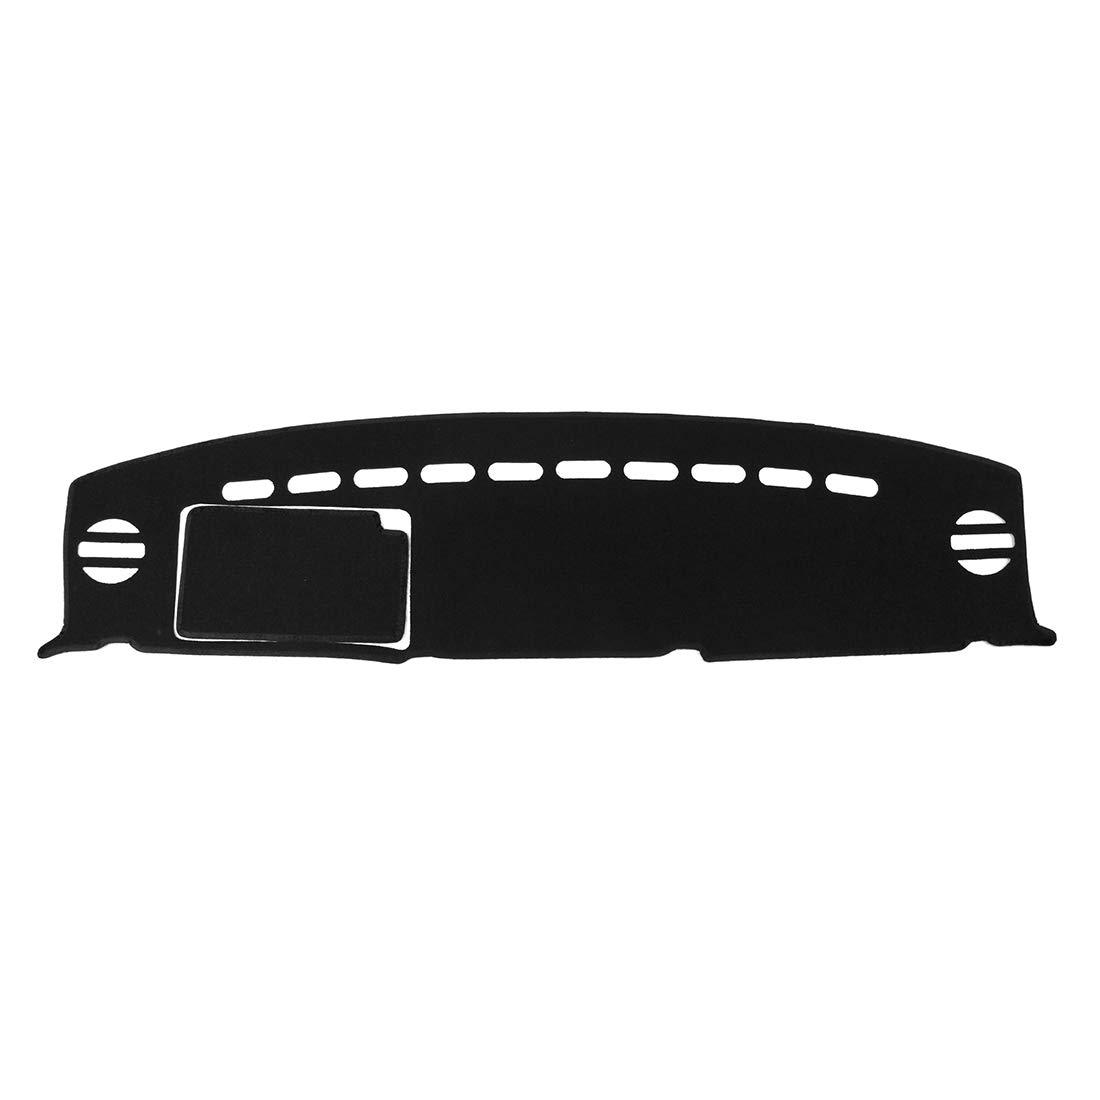 X AUTOHAUX Car Dashboard Cover Nonslip Black Dash Mat Sun Pad for Toyota FJ Cruiser